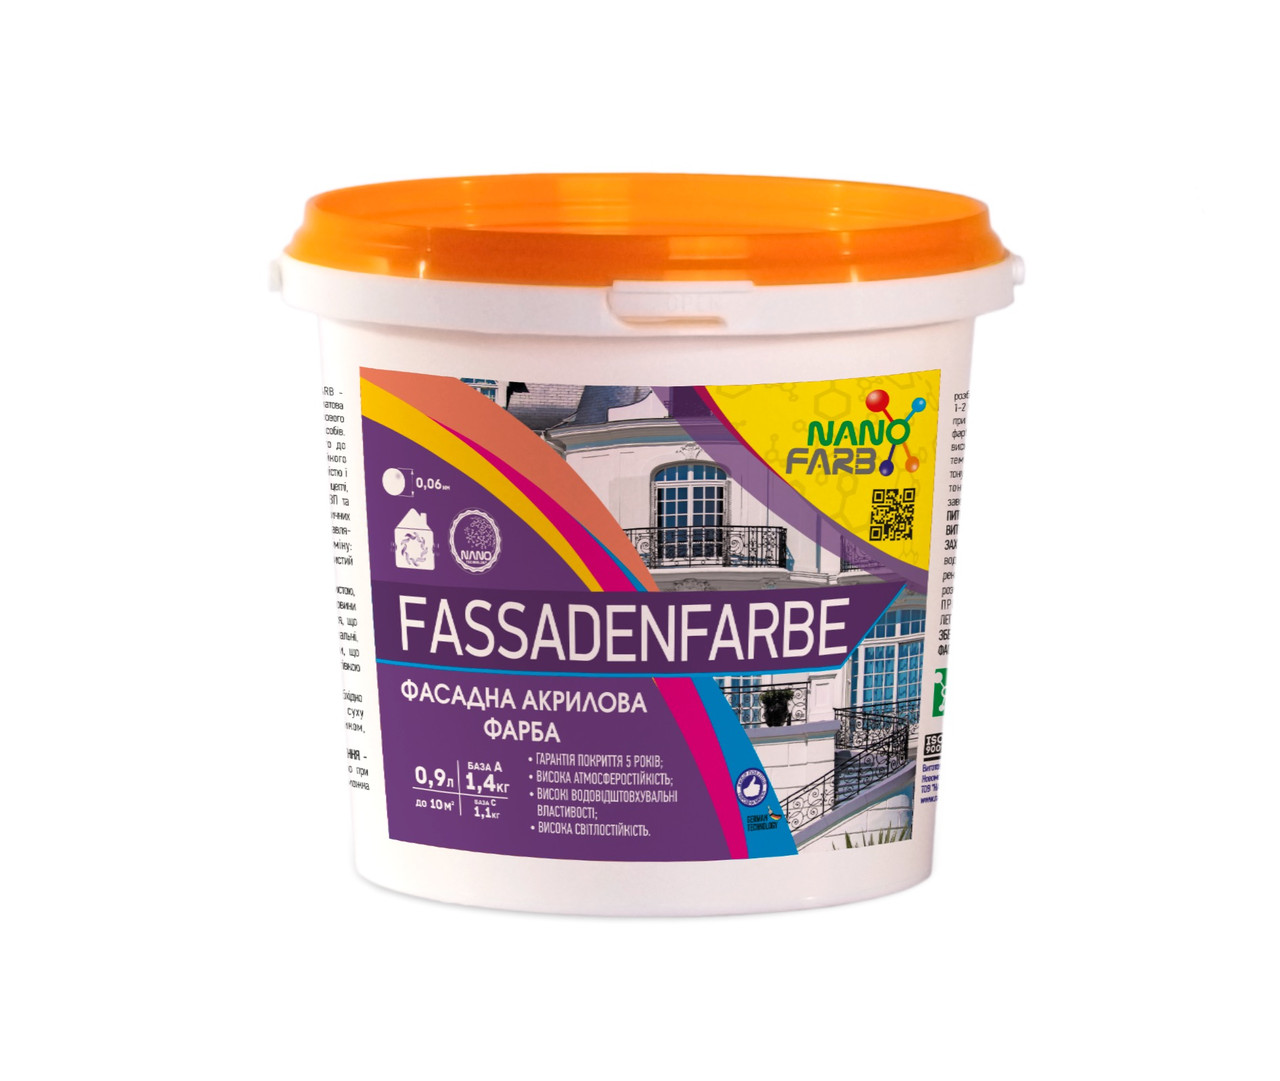 Нанофарб Fassadenfarbe фарба фасадна 7,0 кг